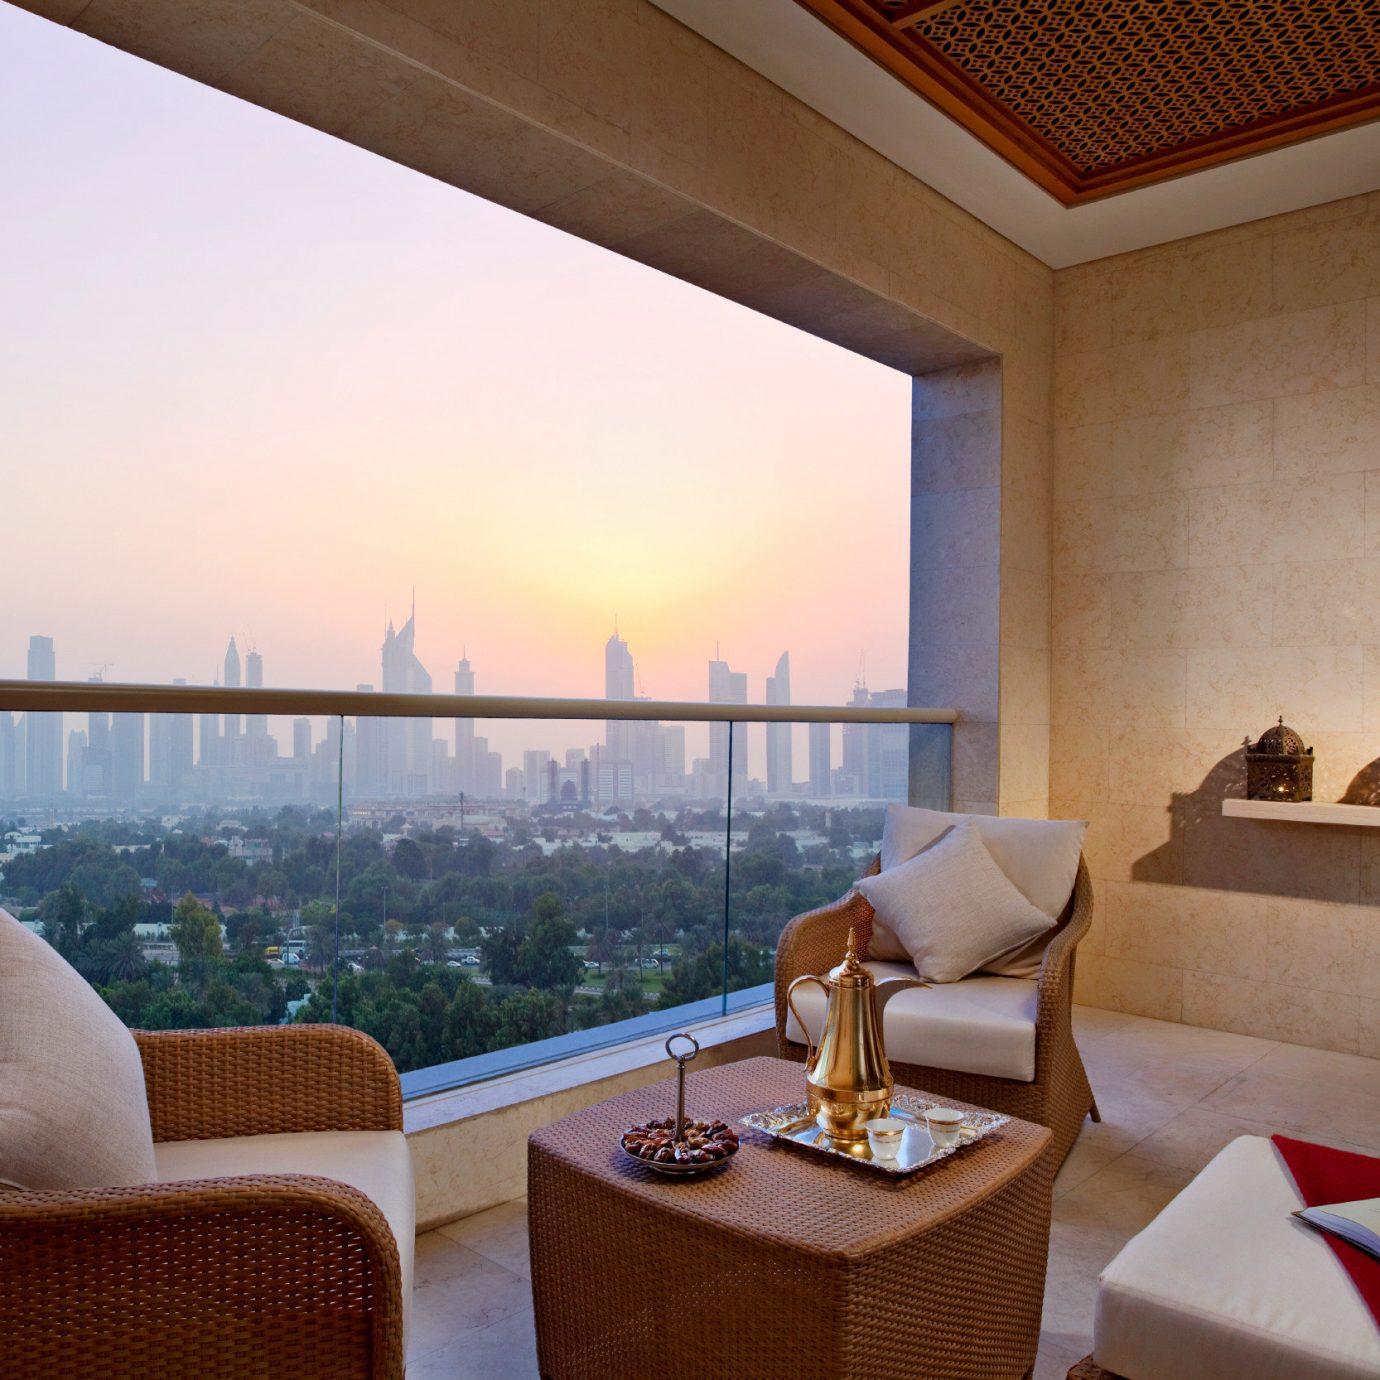 City Lounge Luxury Scenic views sofa property Resort house Villa home living room Suite condominium